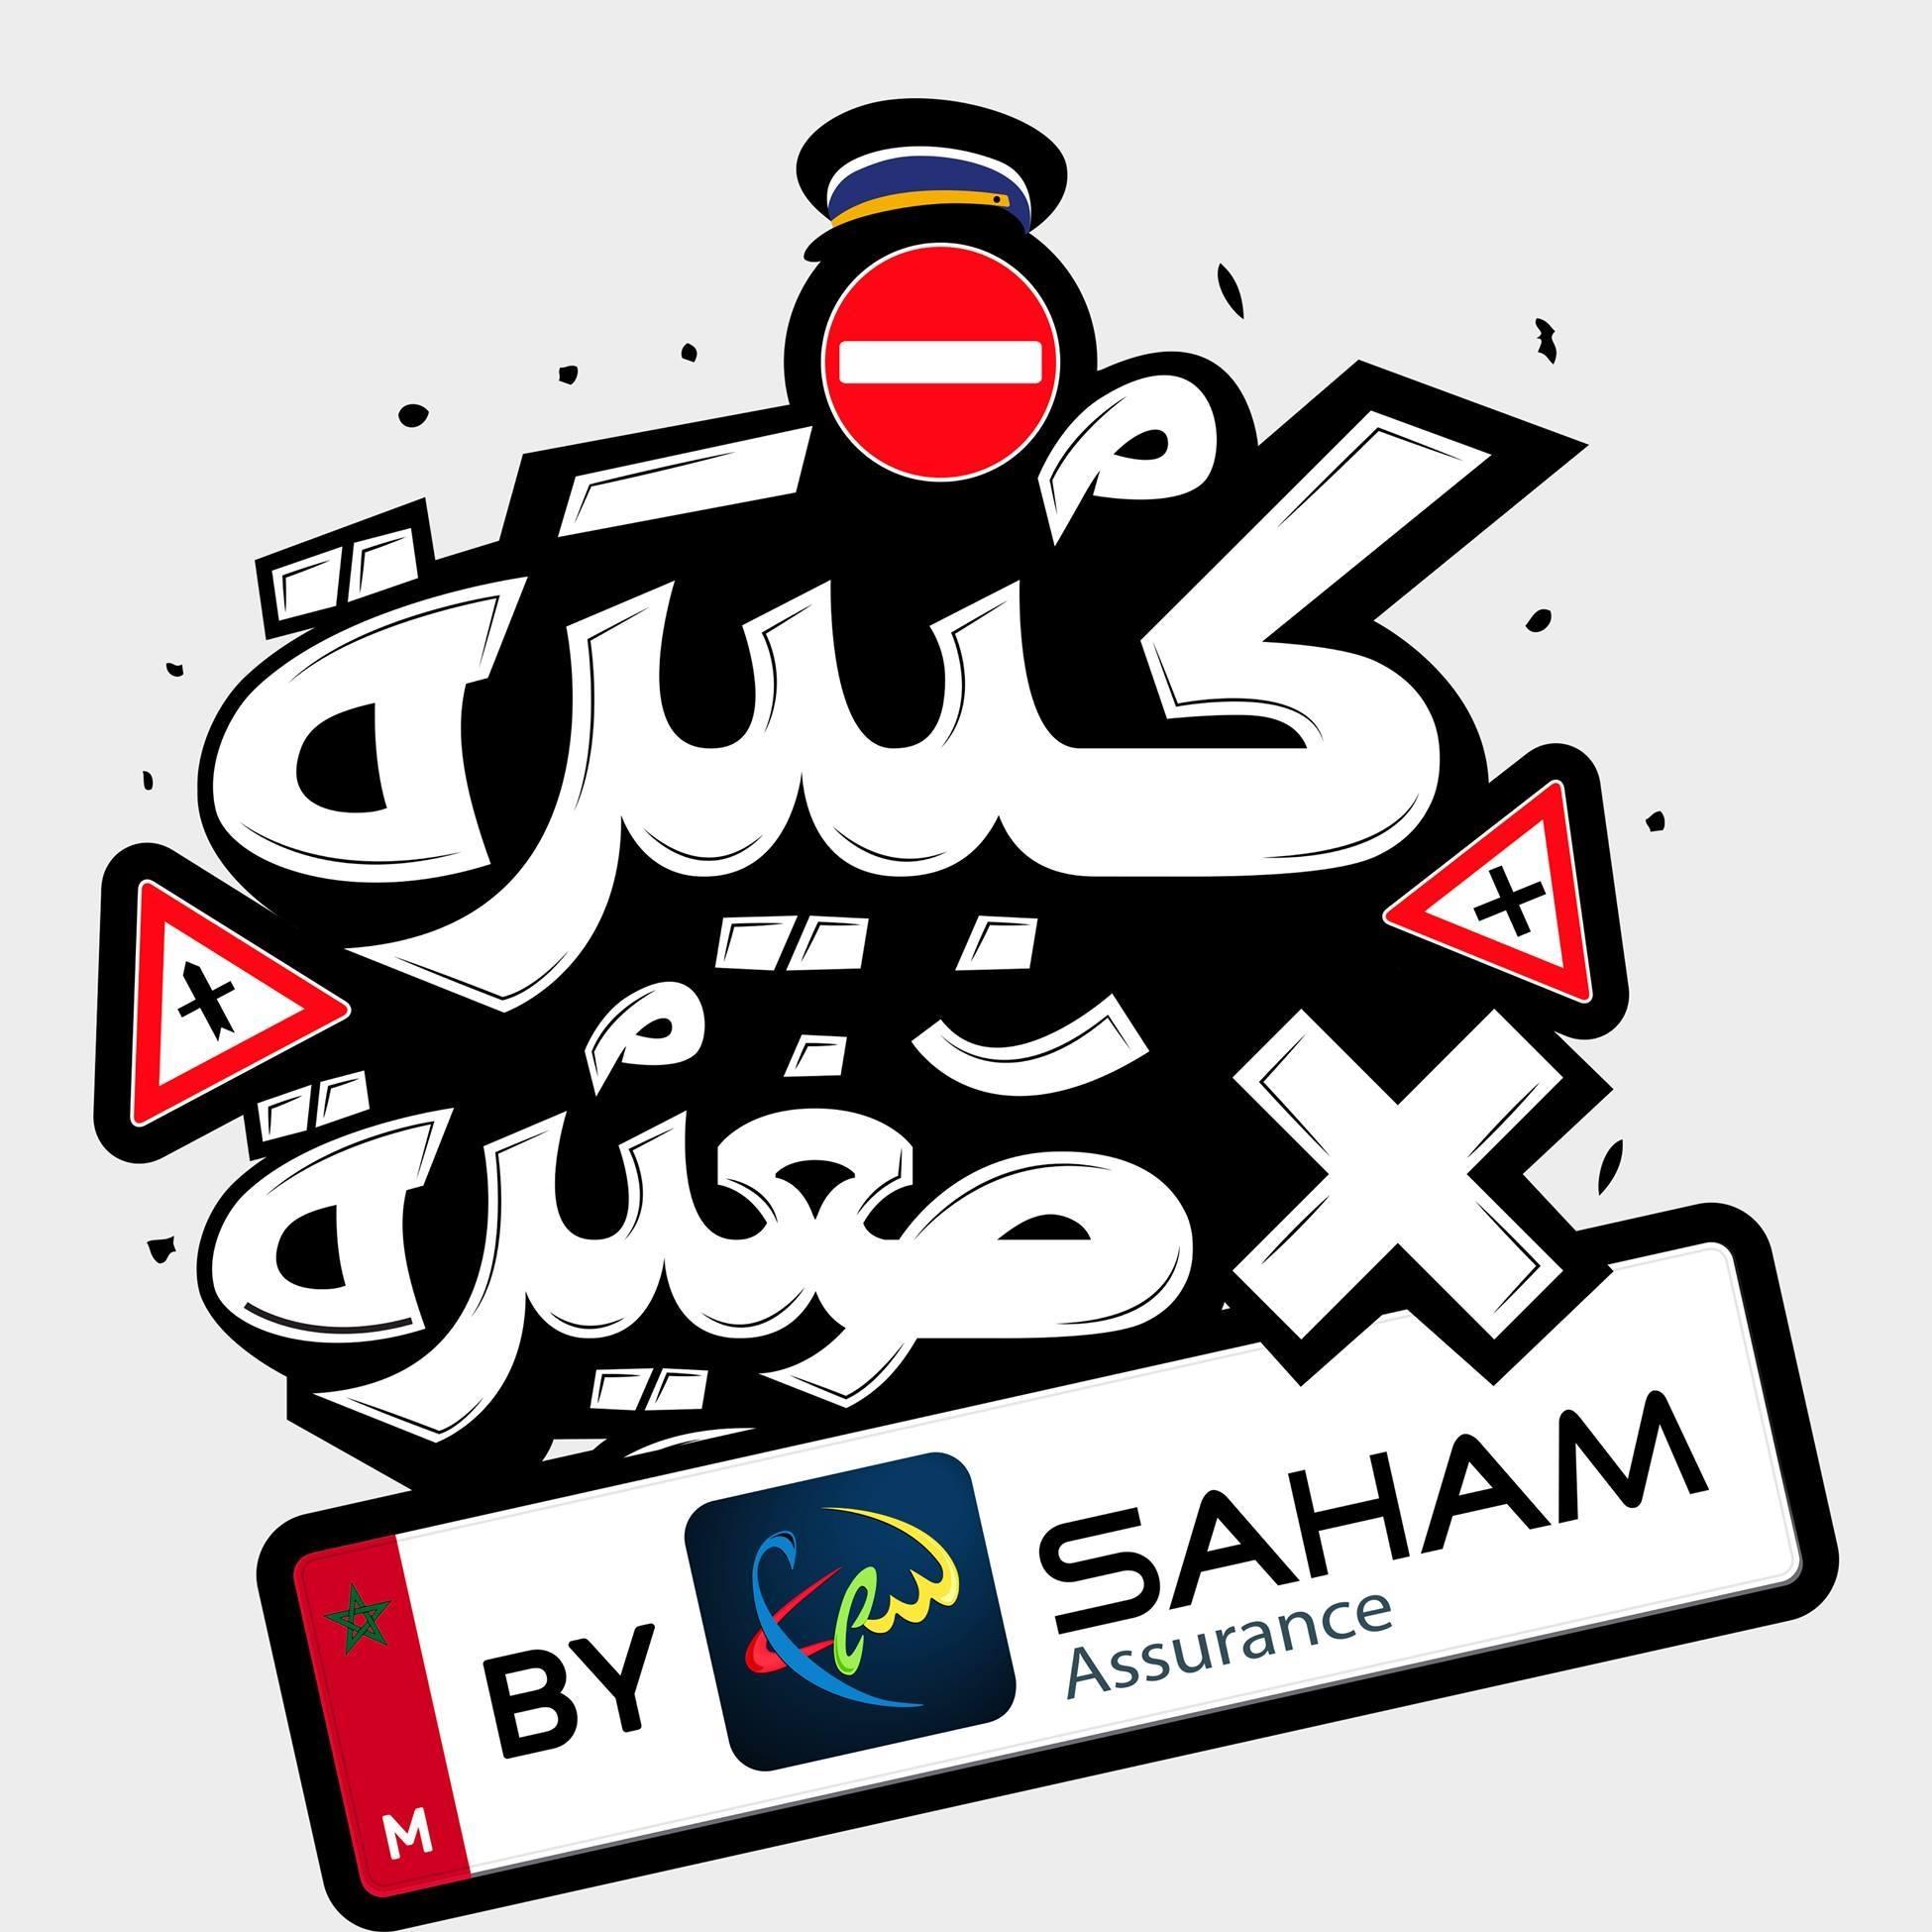 Saham Assurance lance la plateforme kbirafsghira.ma